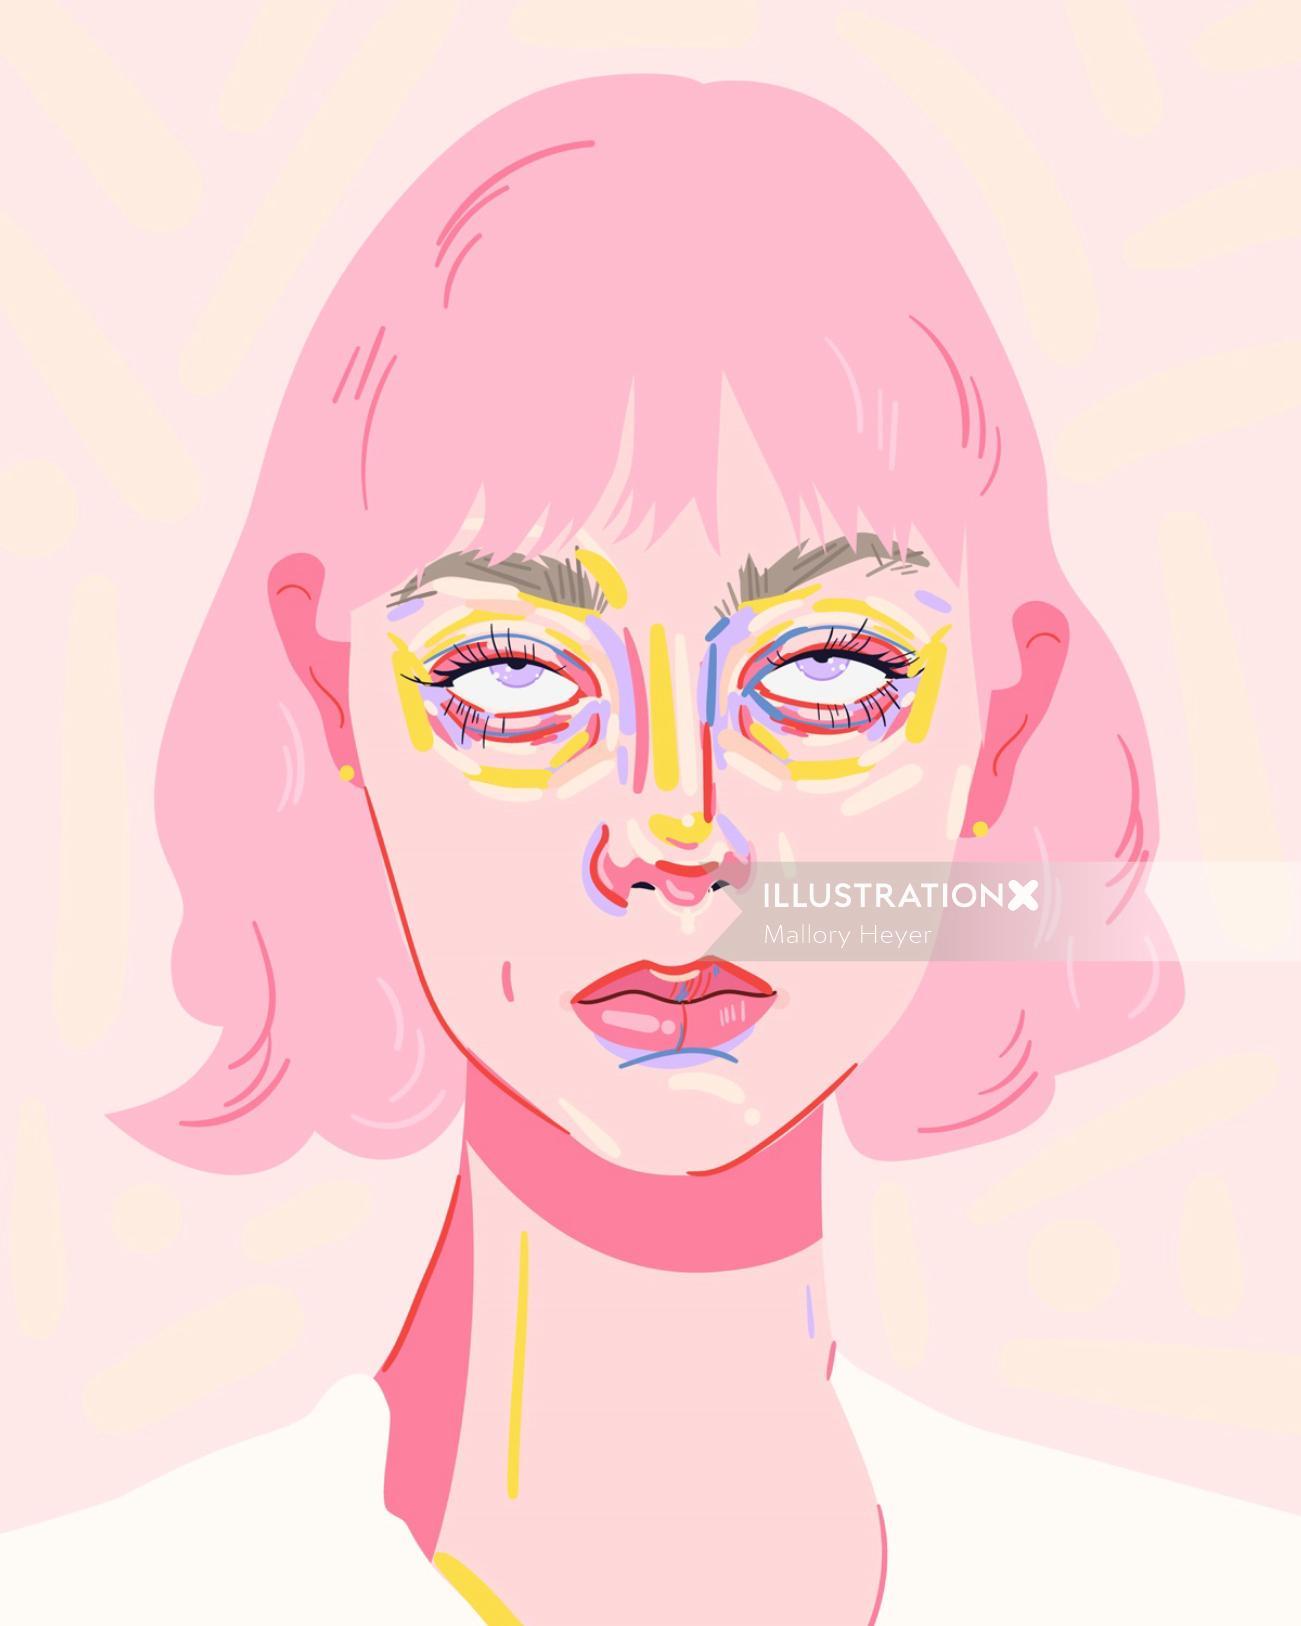 Portrait illustration of a girl rolling her eyes